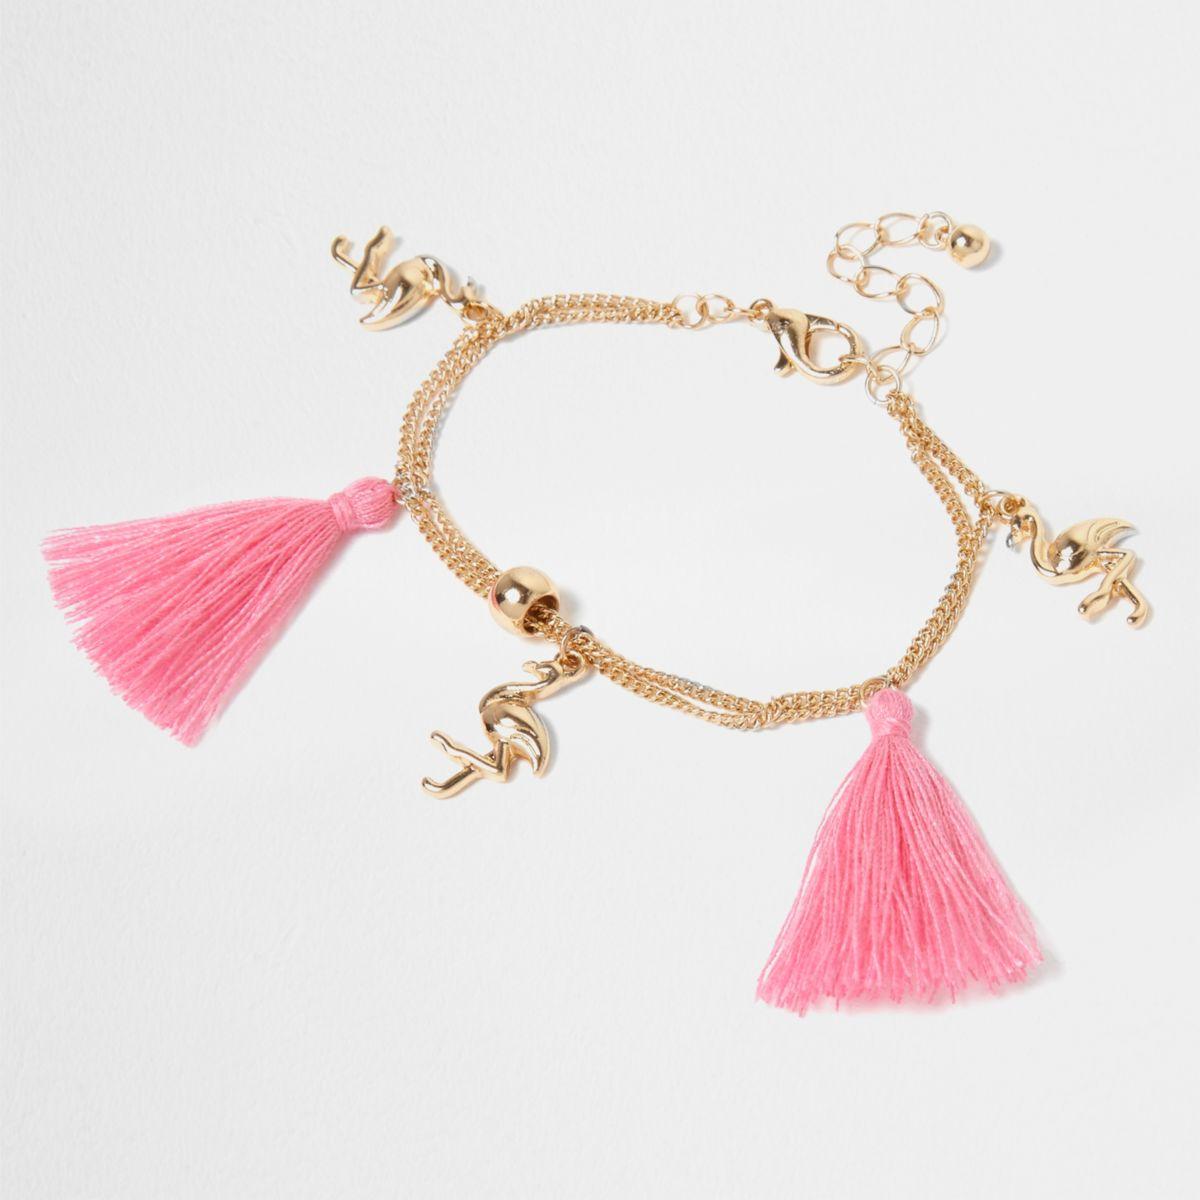 Girls gold tone pink tassel charm bracelet - Jewellery - Accessories ...